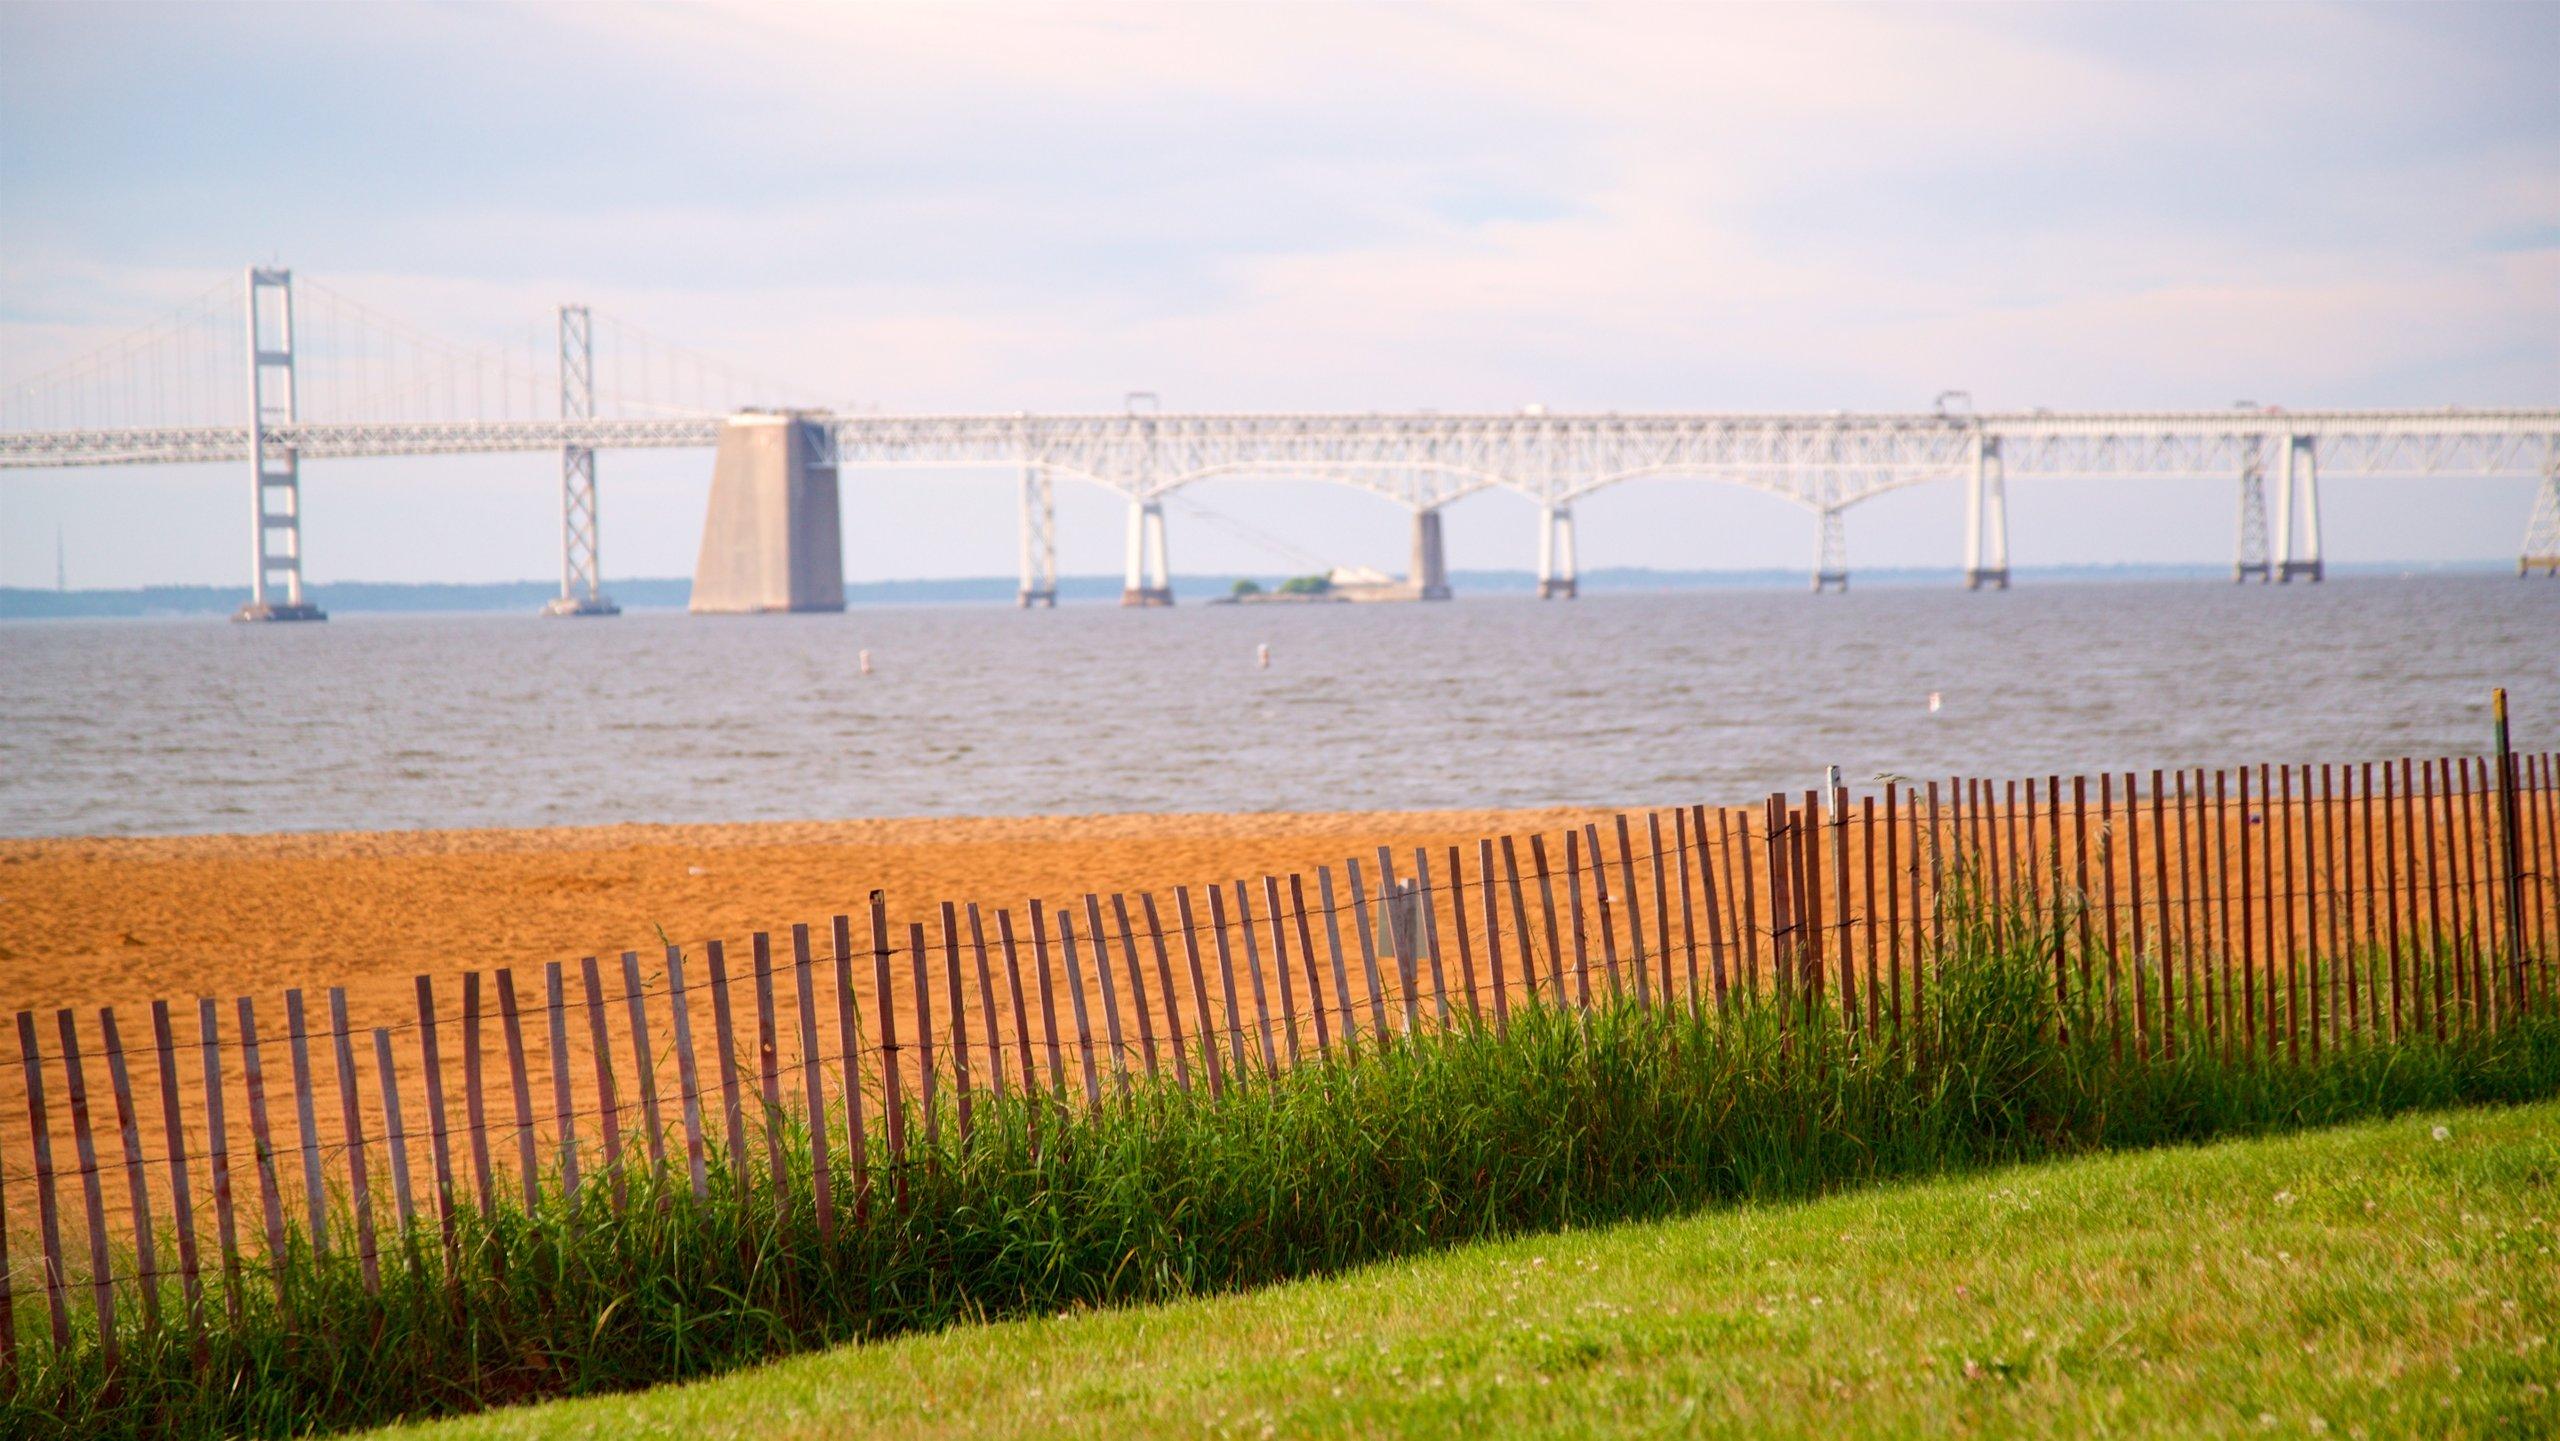 Chesapeake Bay Bridge, Annapolis, Maryland, United States of America